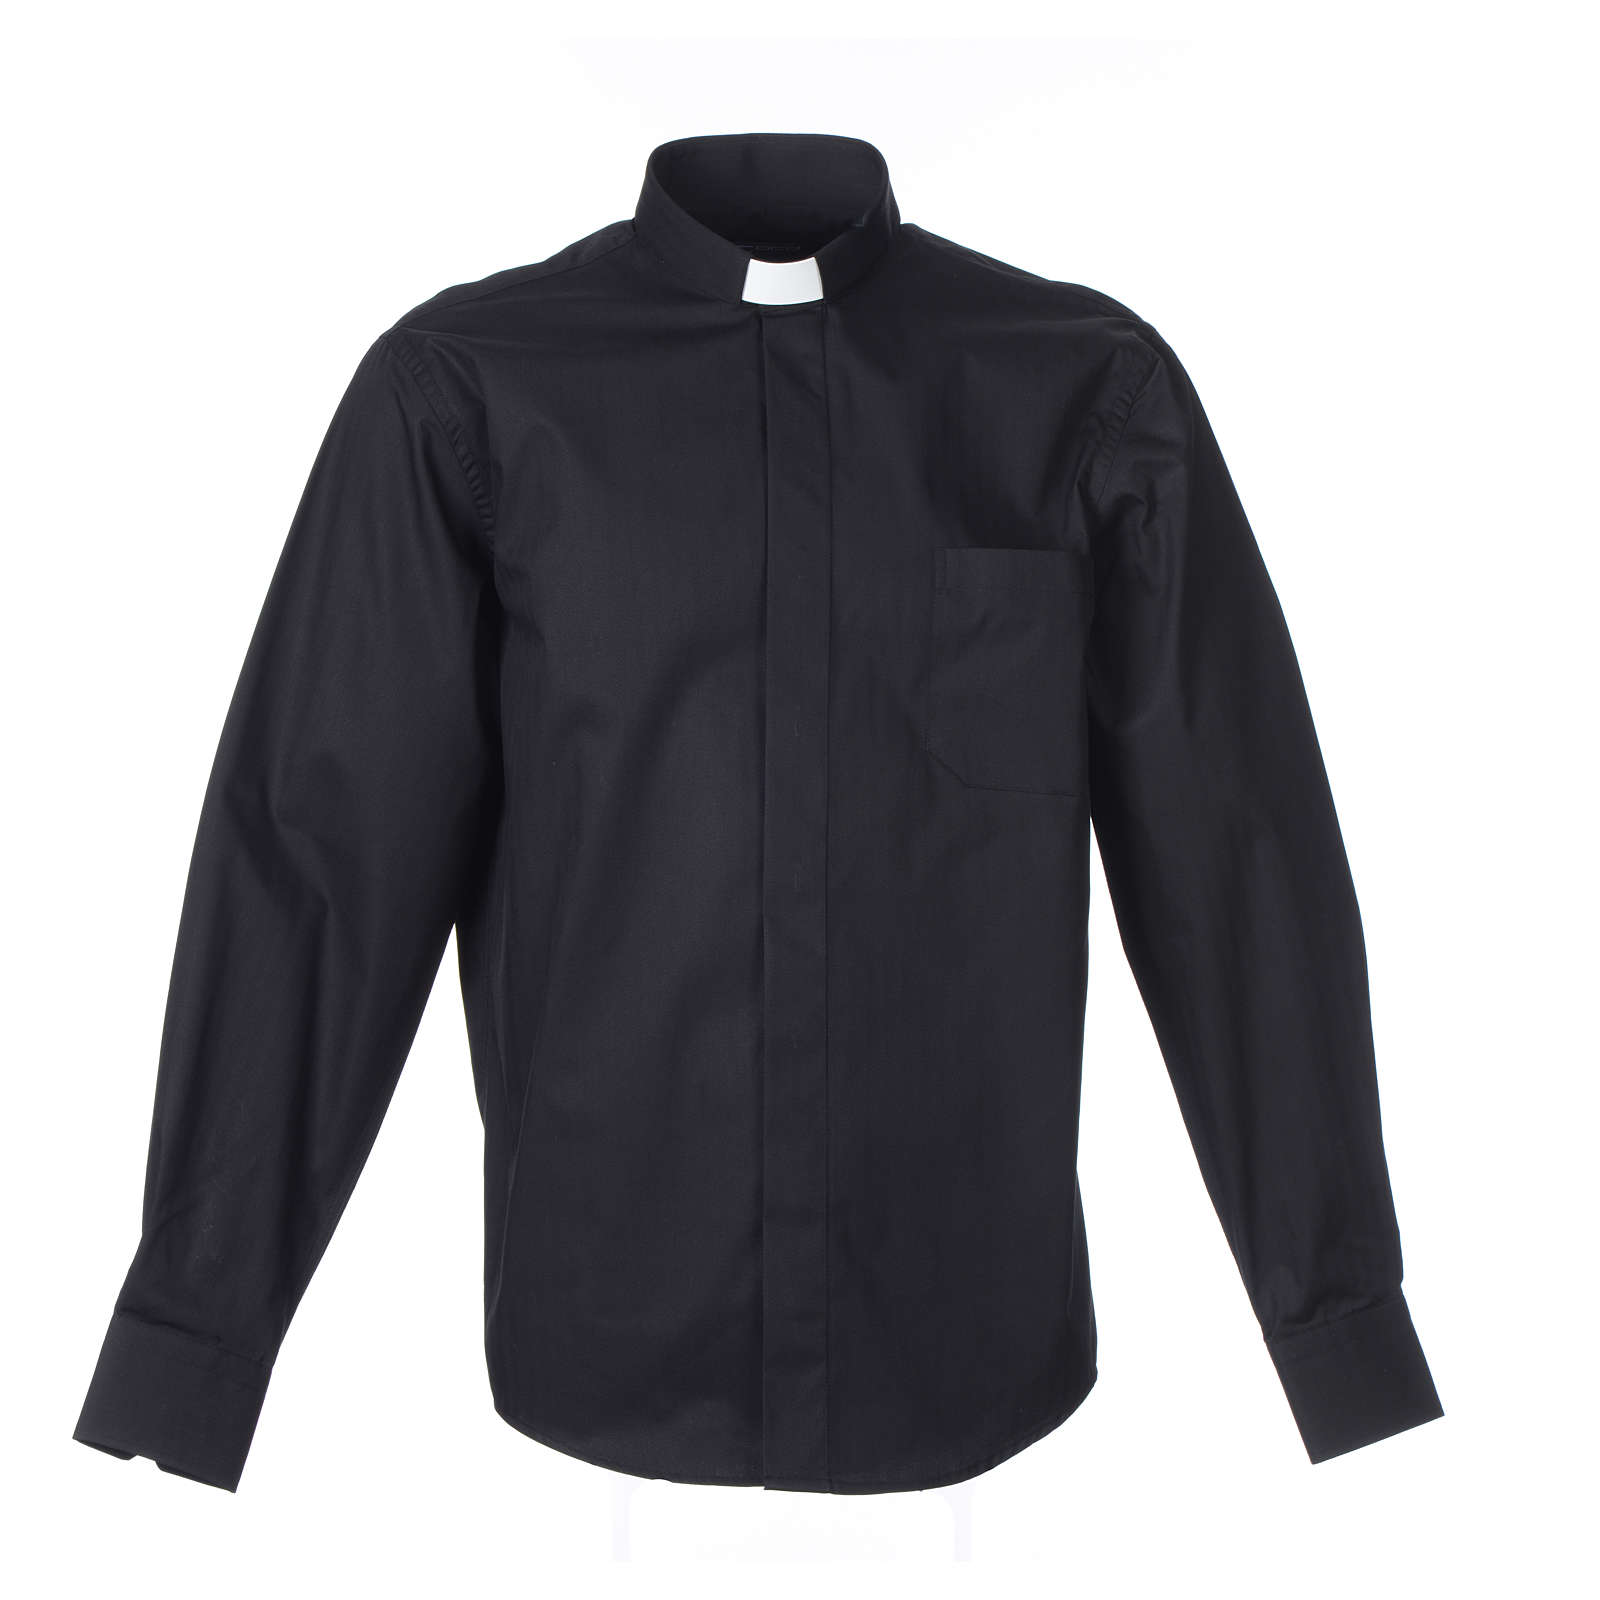 Pastor Long Sleeve Shirt easy-iron mixed herringbone cotton Black 4